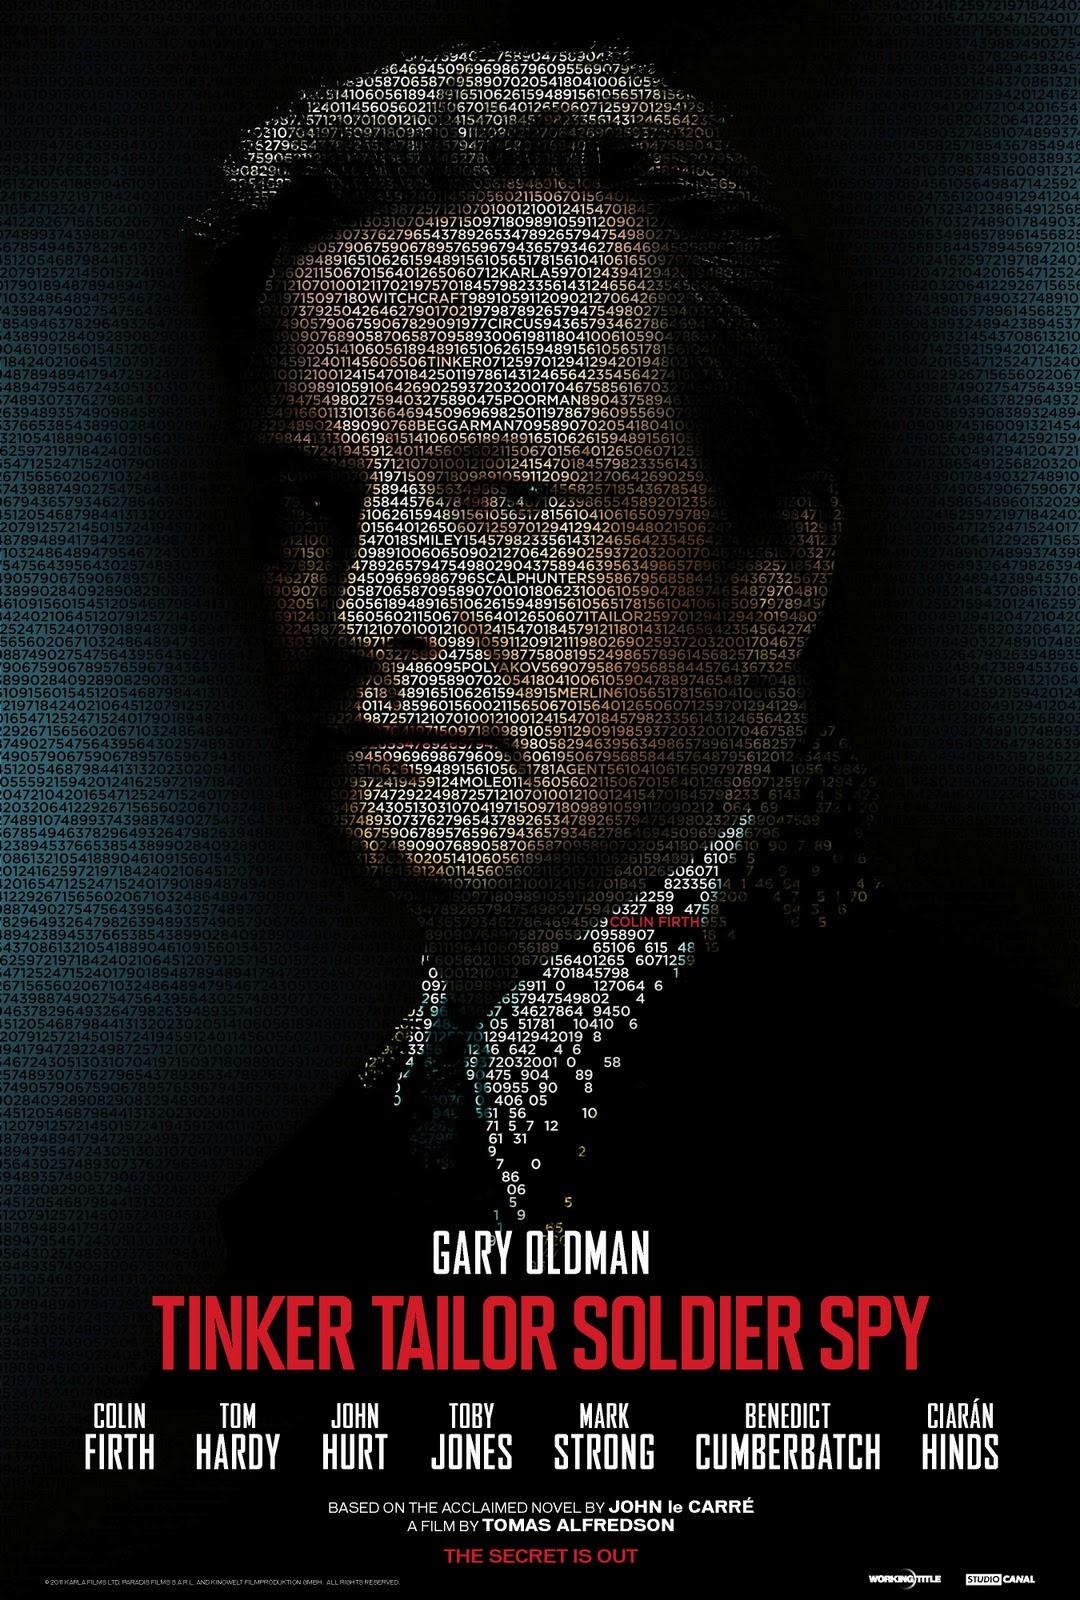 http://2.bp.blogspot.com/-_5iTeFxTxKo/TvqX8WqRbWI/AAAAAAAAB64/bS7V9CRNSso/s1600/Tinker-Tailor-Soldier-Spy-03.jpg